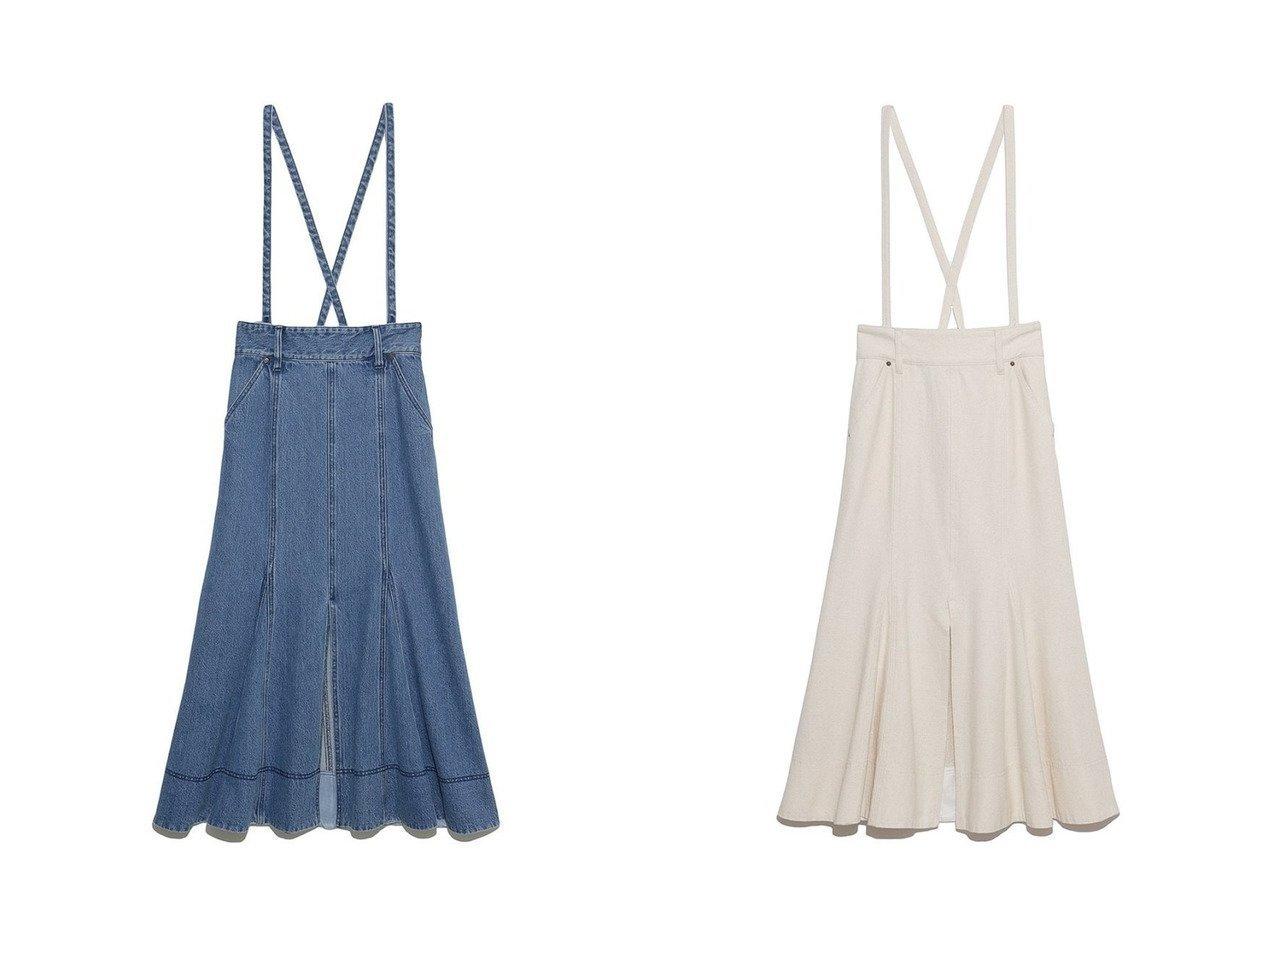 【Lily Brown/リリーブラウン】のサスペンダー付きデニムスカート 【スカート】おすすめ!人気、トレンド・レディースファッションの通販 おすすめ人気トレンドファッション通販アイテム インテリア・キッズ・メンズ・レディースファッション・服の通販 founy(ファニー)  ファッション Fashion レディースファッション WOMEN スカート Skirt デニムスカート Denim Skirts ロングスカート Long Skirt オックス サスペンダー サロペット スリット デニム フロント ベーシック ポケット マーメイド リボン ロング |ID:crp329100000039868